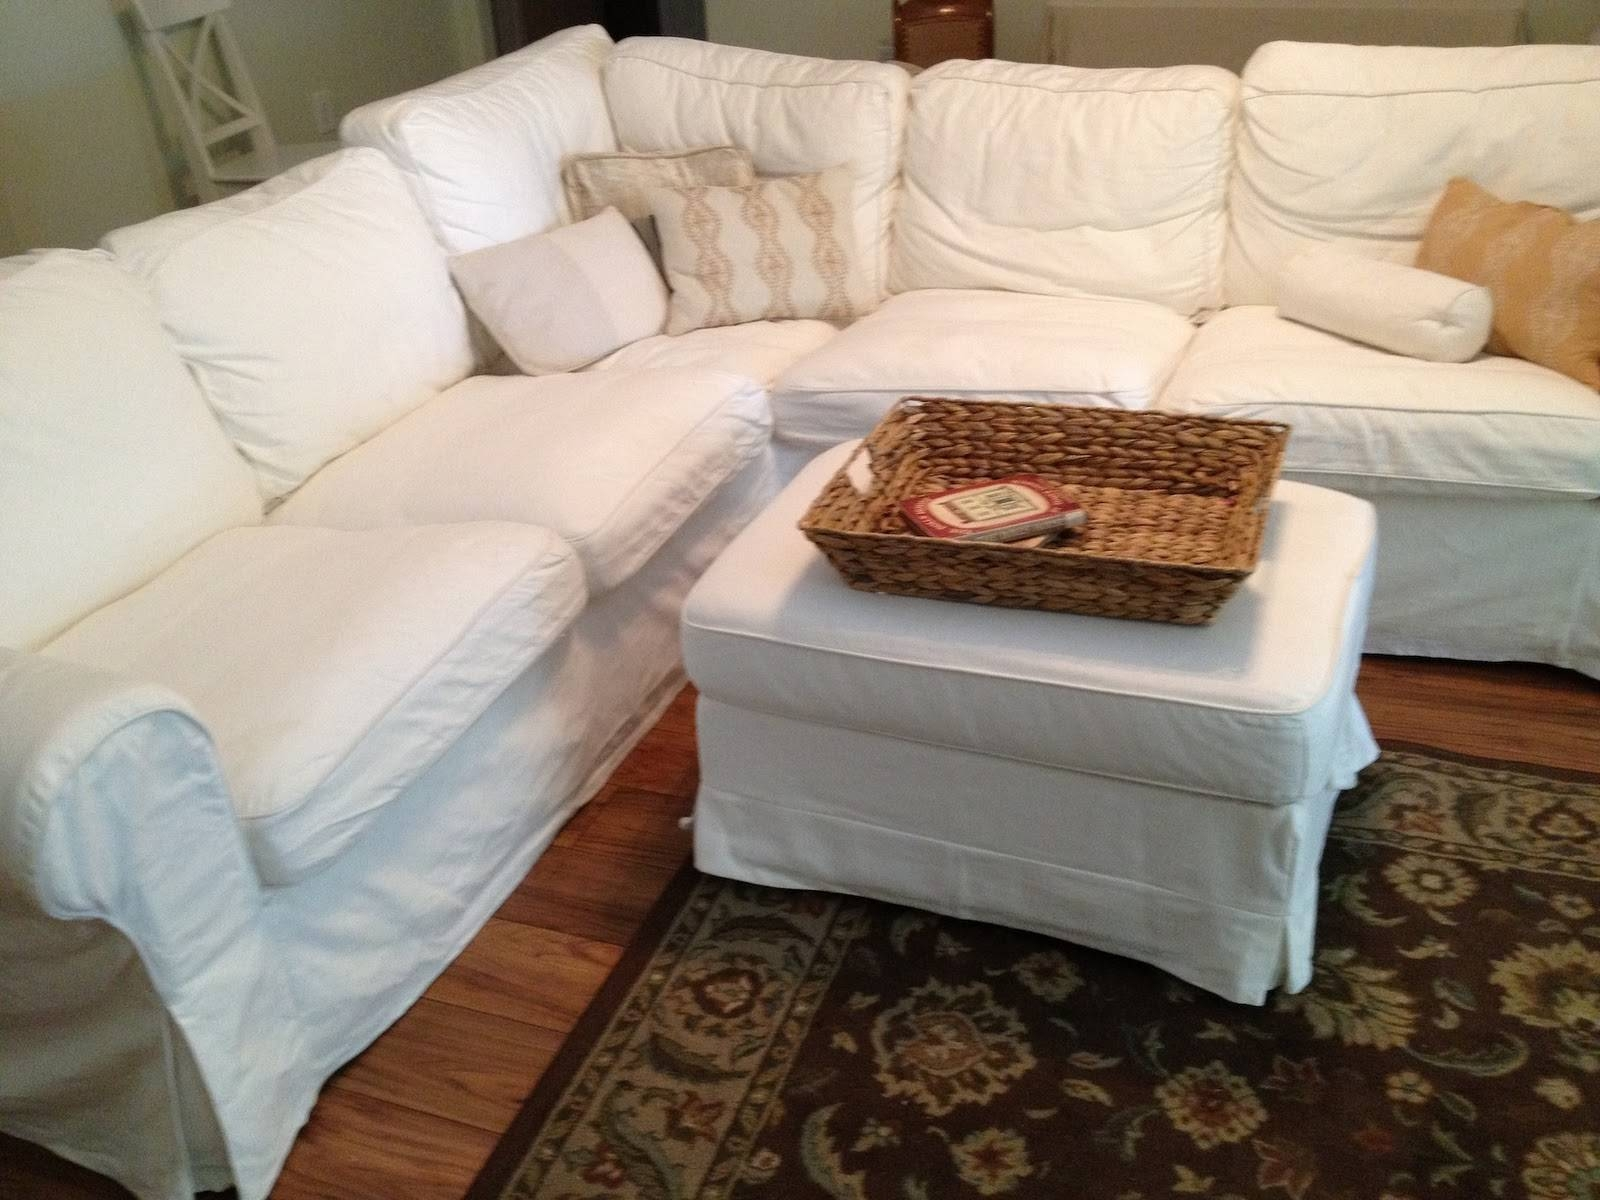 Titus 2 Work In Progress: Ikea Ektorp Sofa Review Part 2 {Follow-Up} throughout 2X2 Corner Sofas (Image 26 of 30)